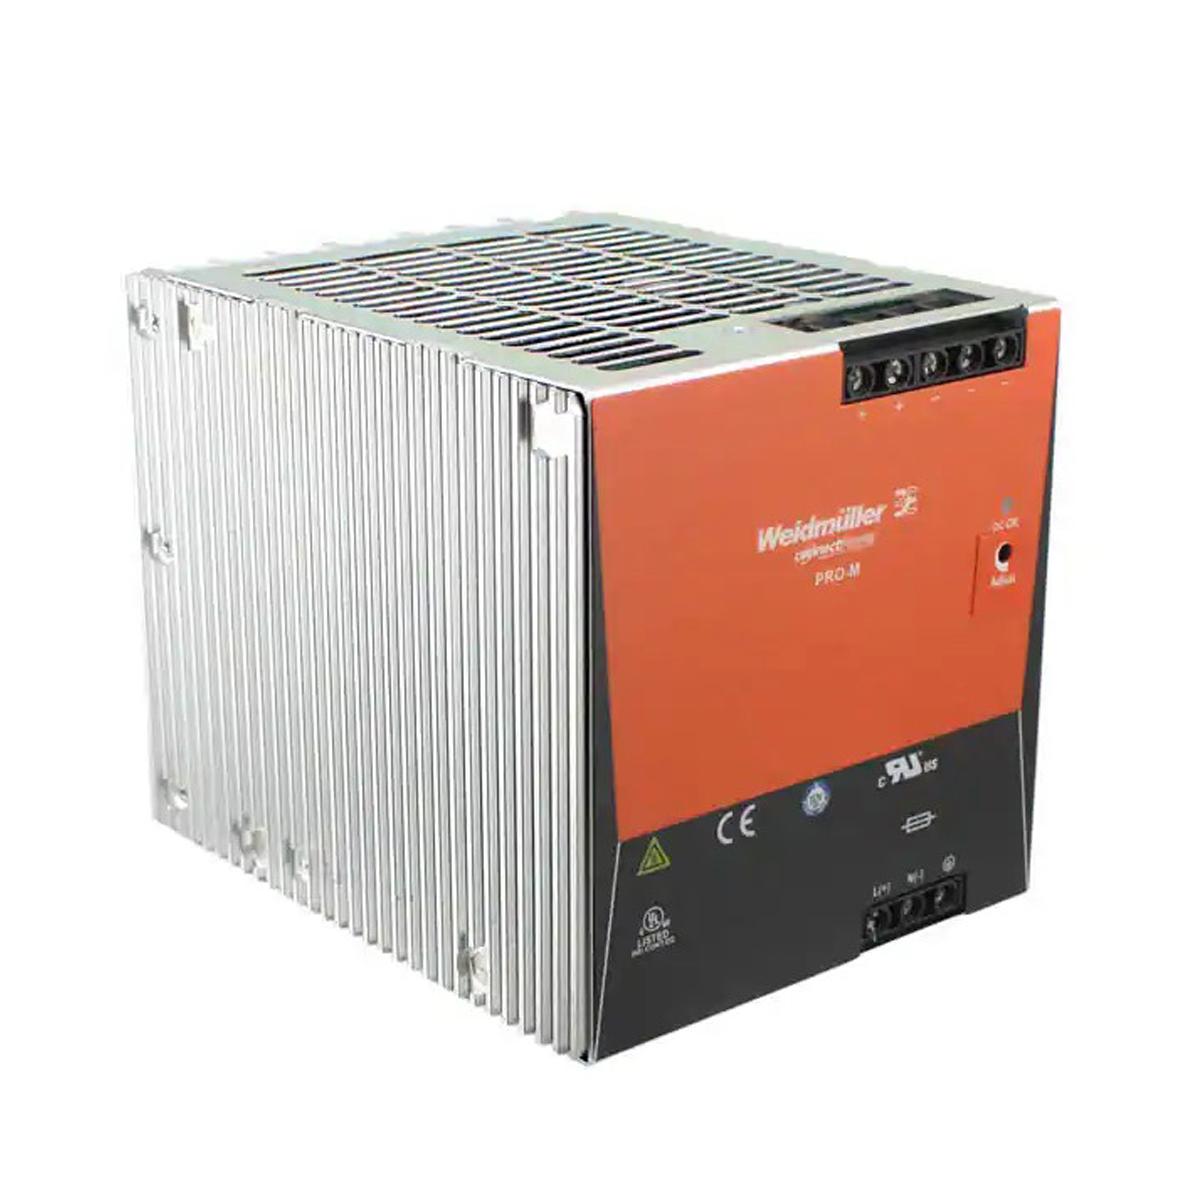 Fuente de poder DIN PS24 480 W para cámaras de seguridad AXIS